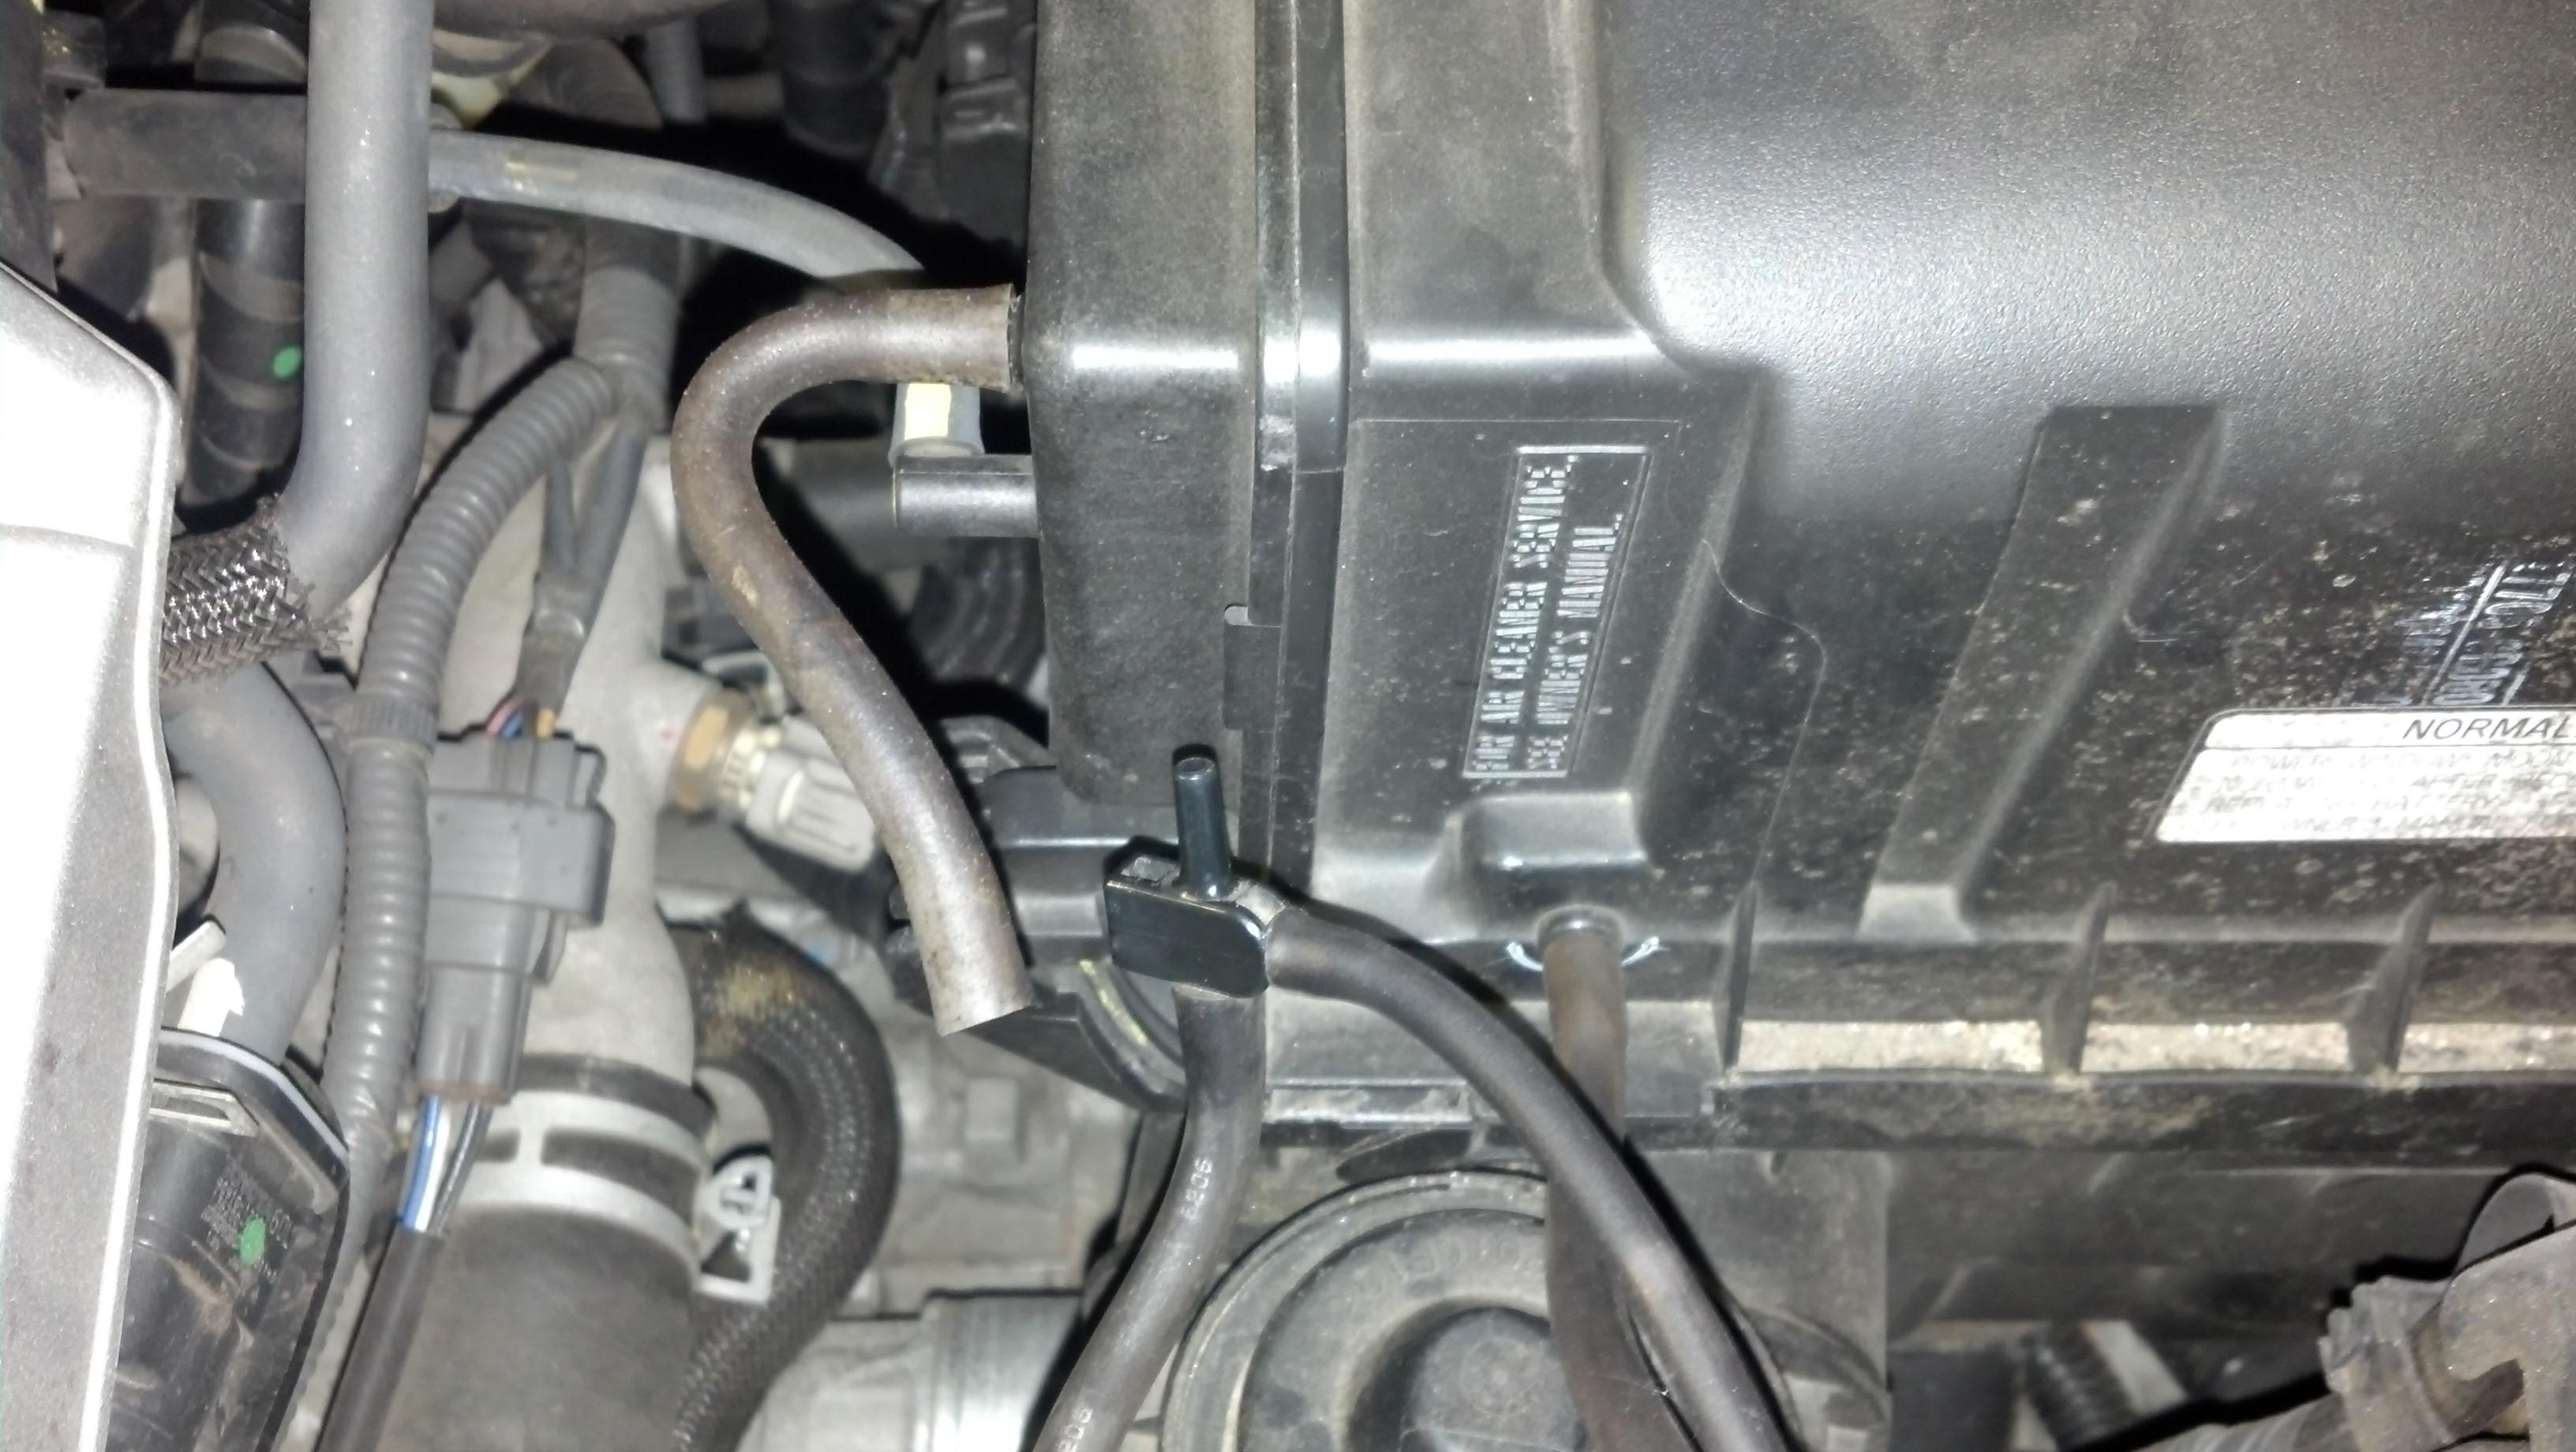 2007 Lexus RX 350 has check engine light and vsc lights lit